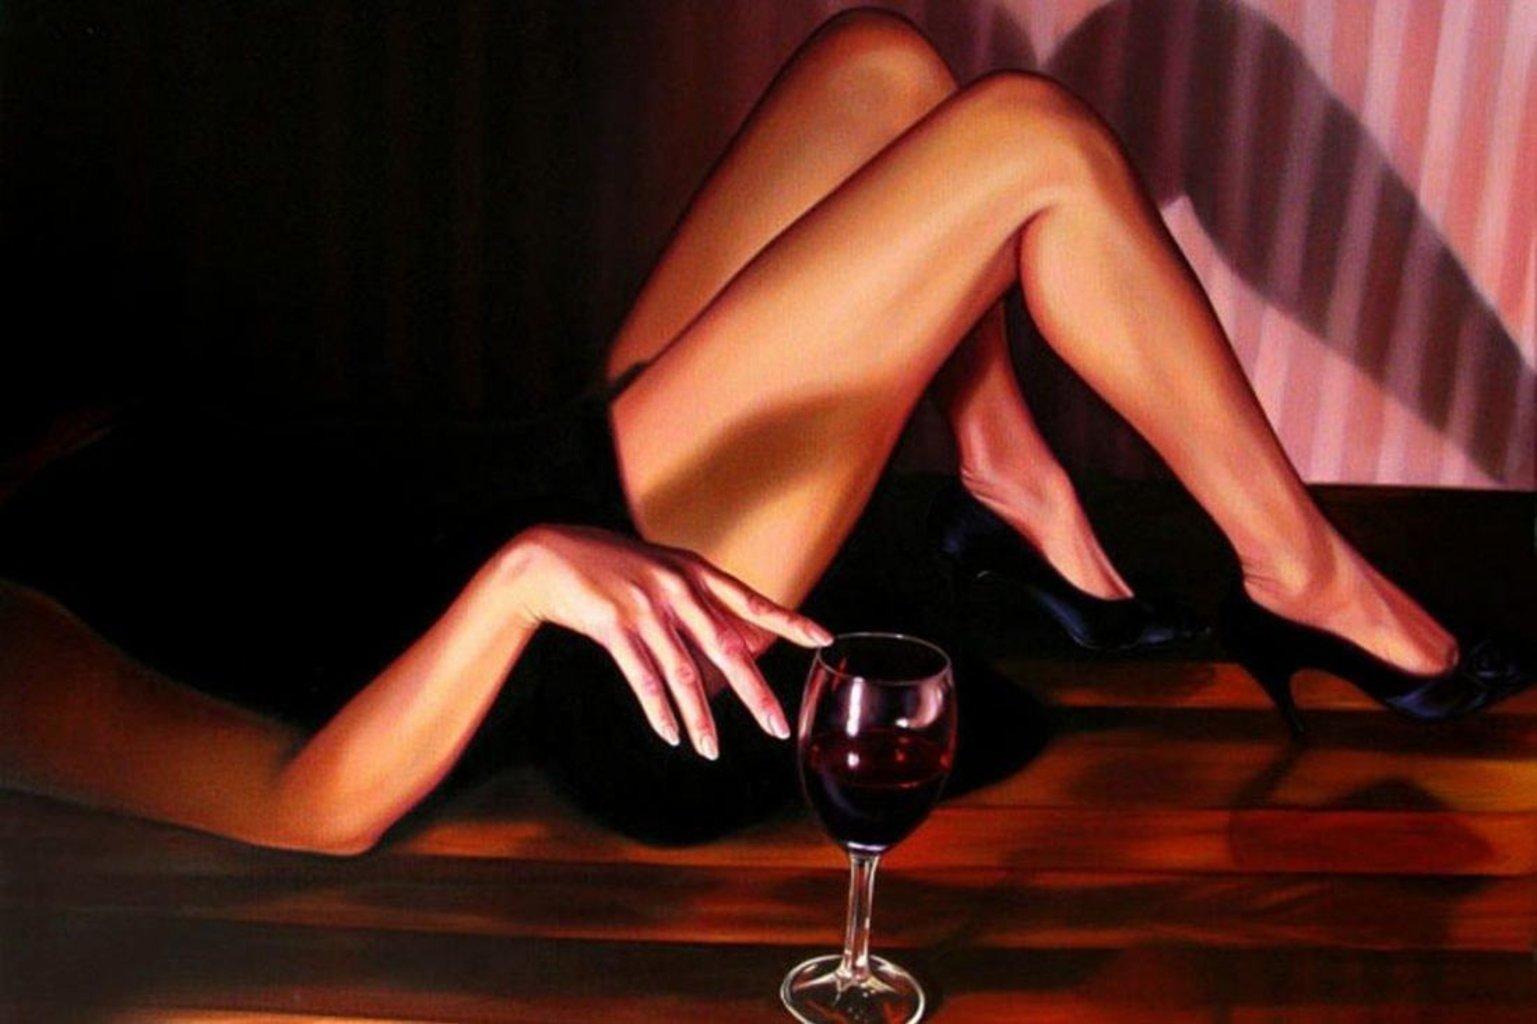 Картинки девушка с бокалом вина на аву, локомотив спартак приколы